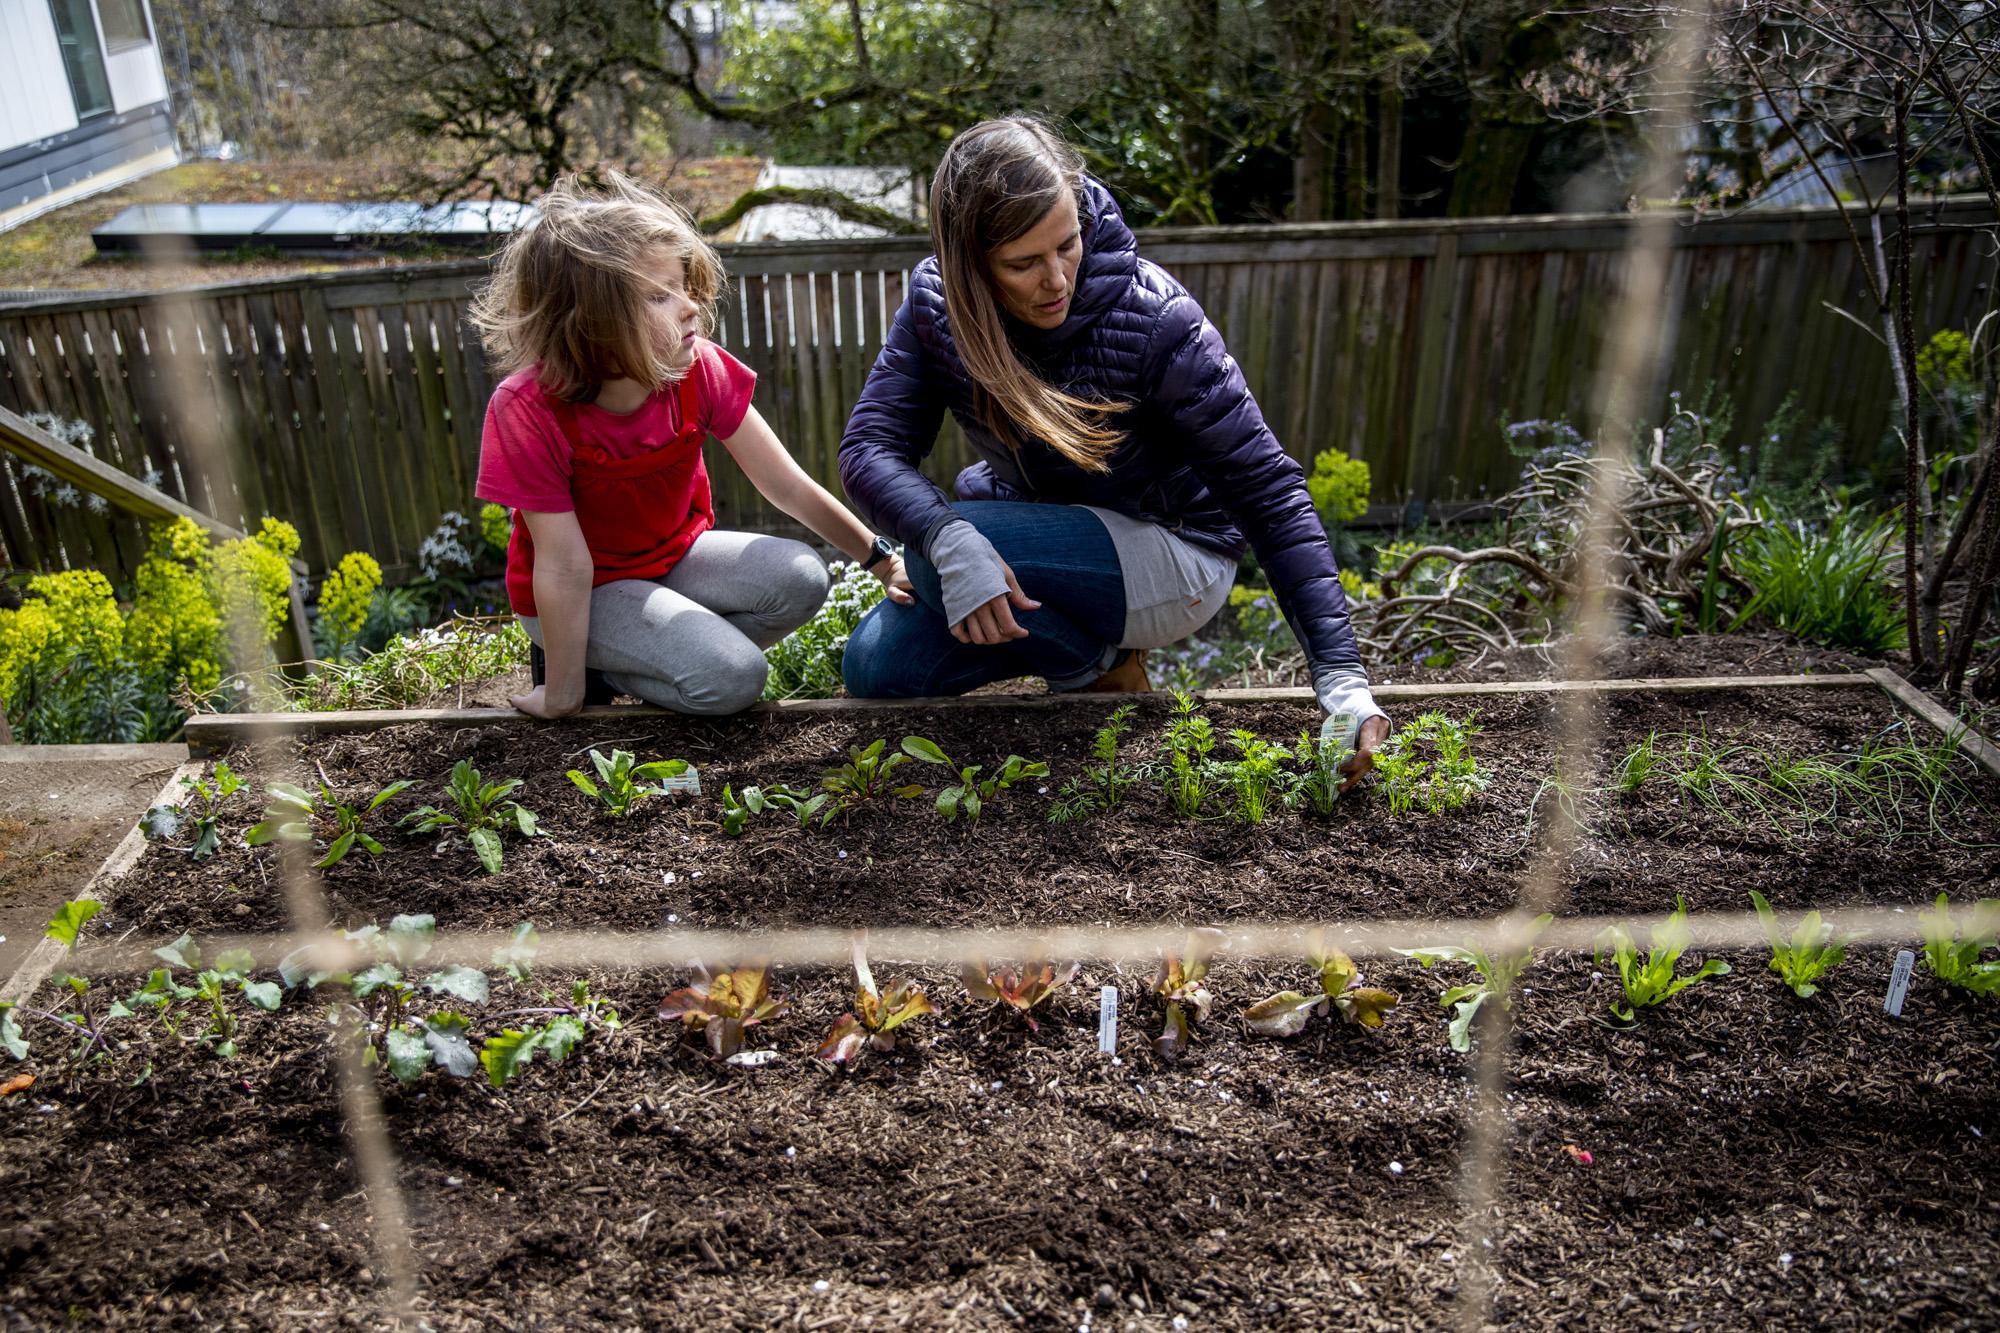 WWII-era 'victory gardens' make a comeback amid coronavirus | Crosscut